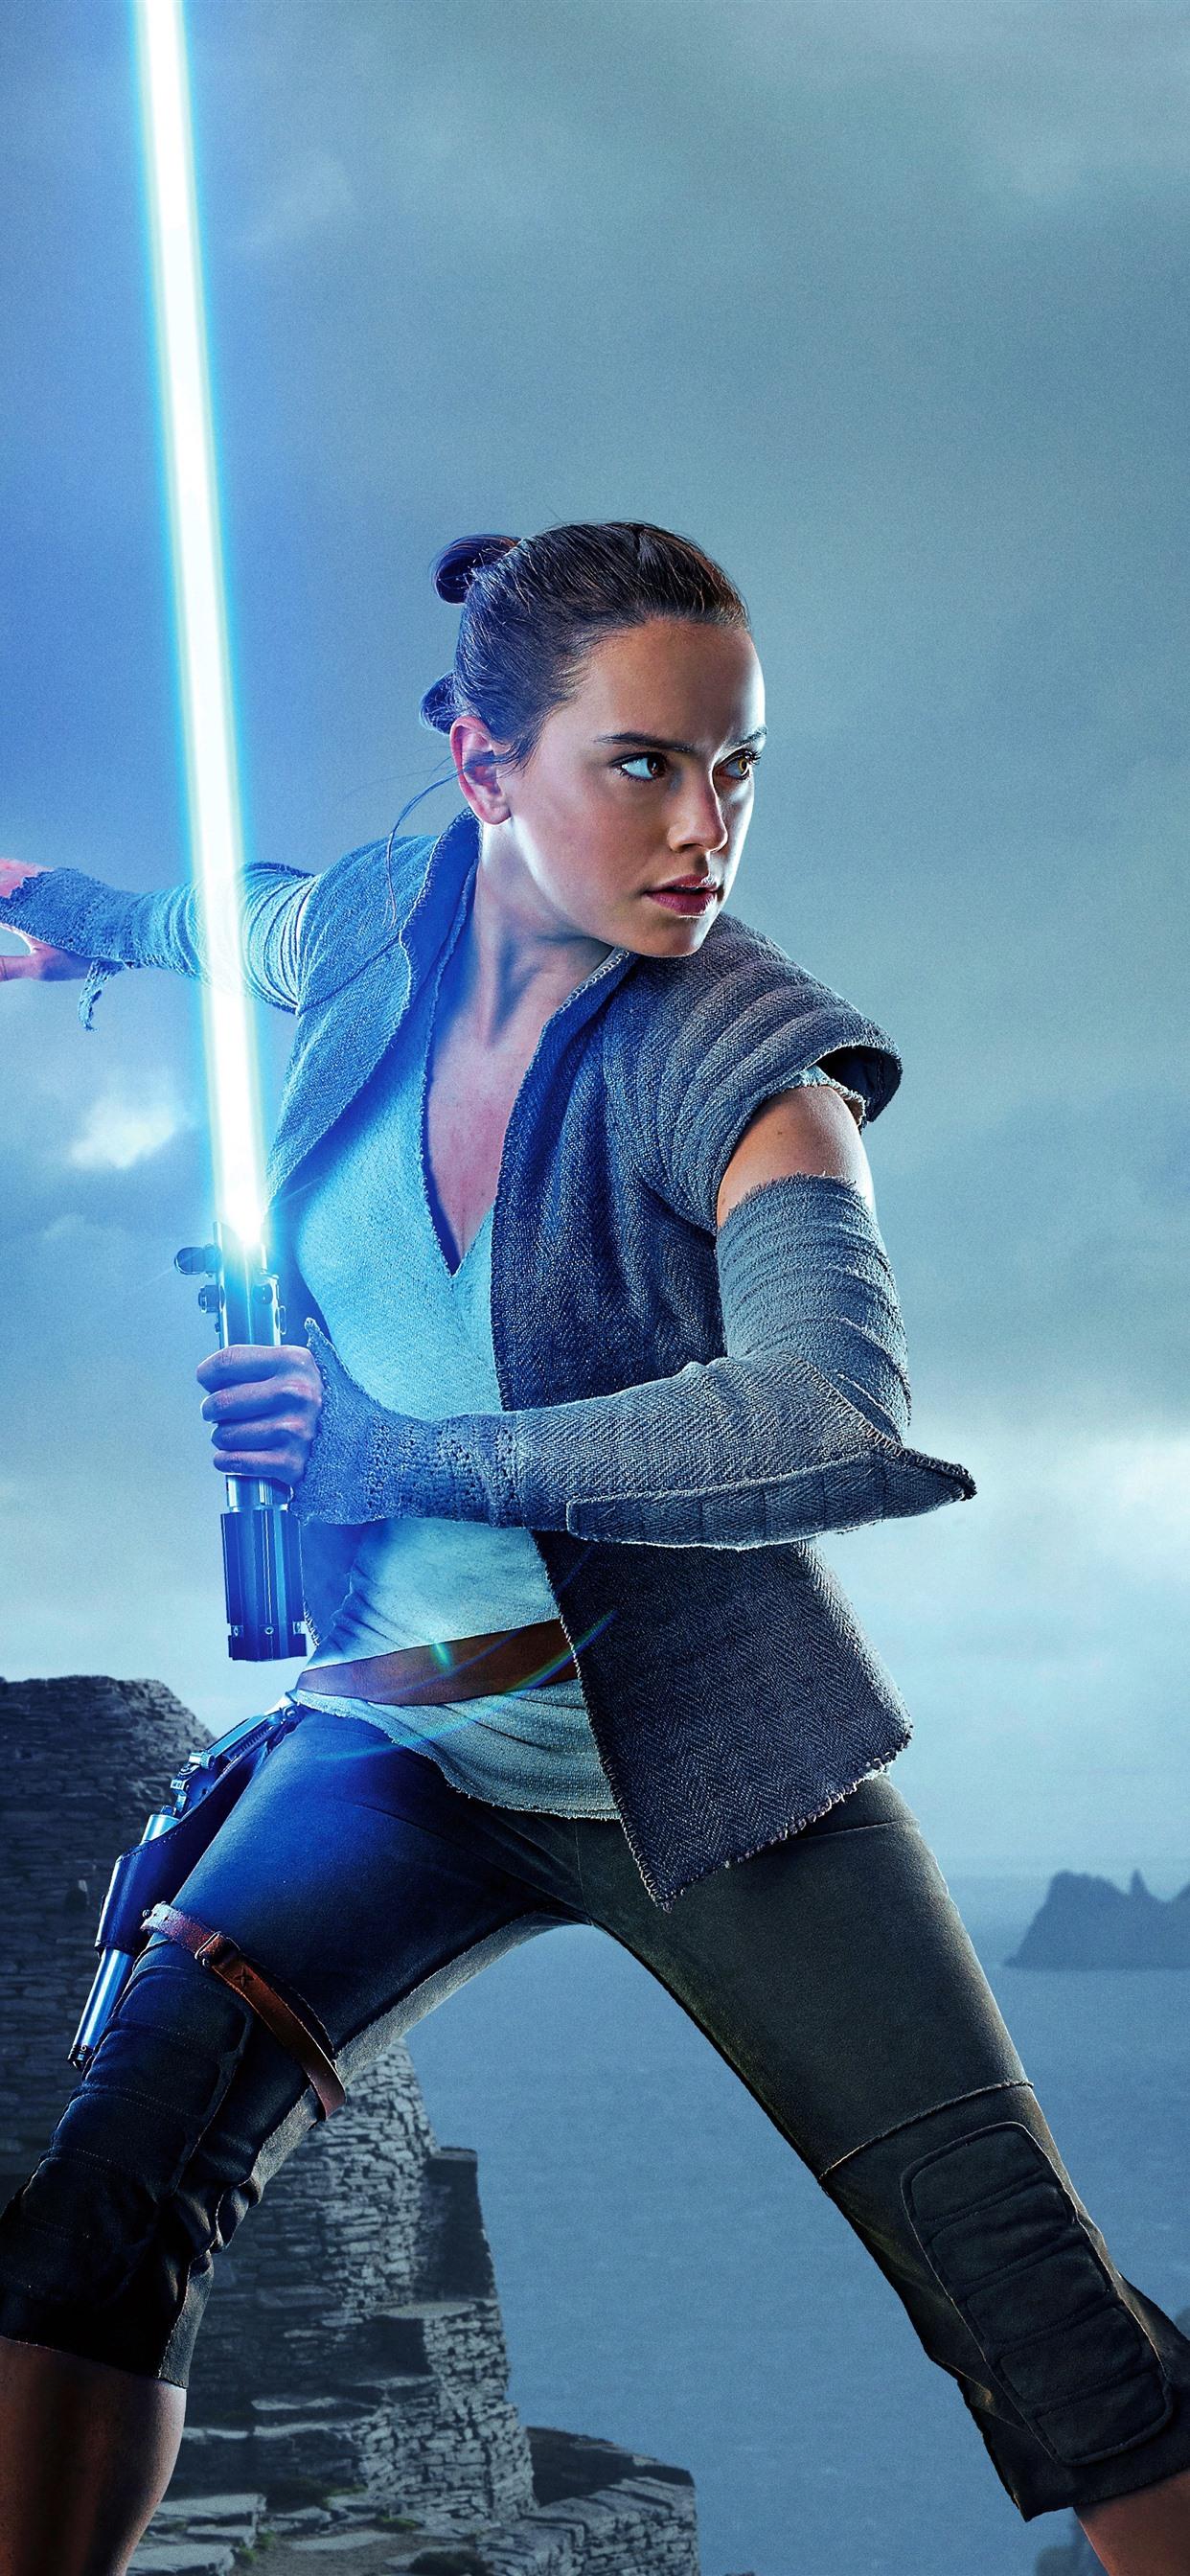 Star Wars The Last Jedi girl laser